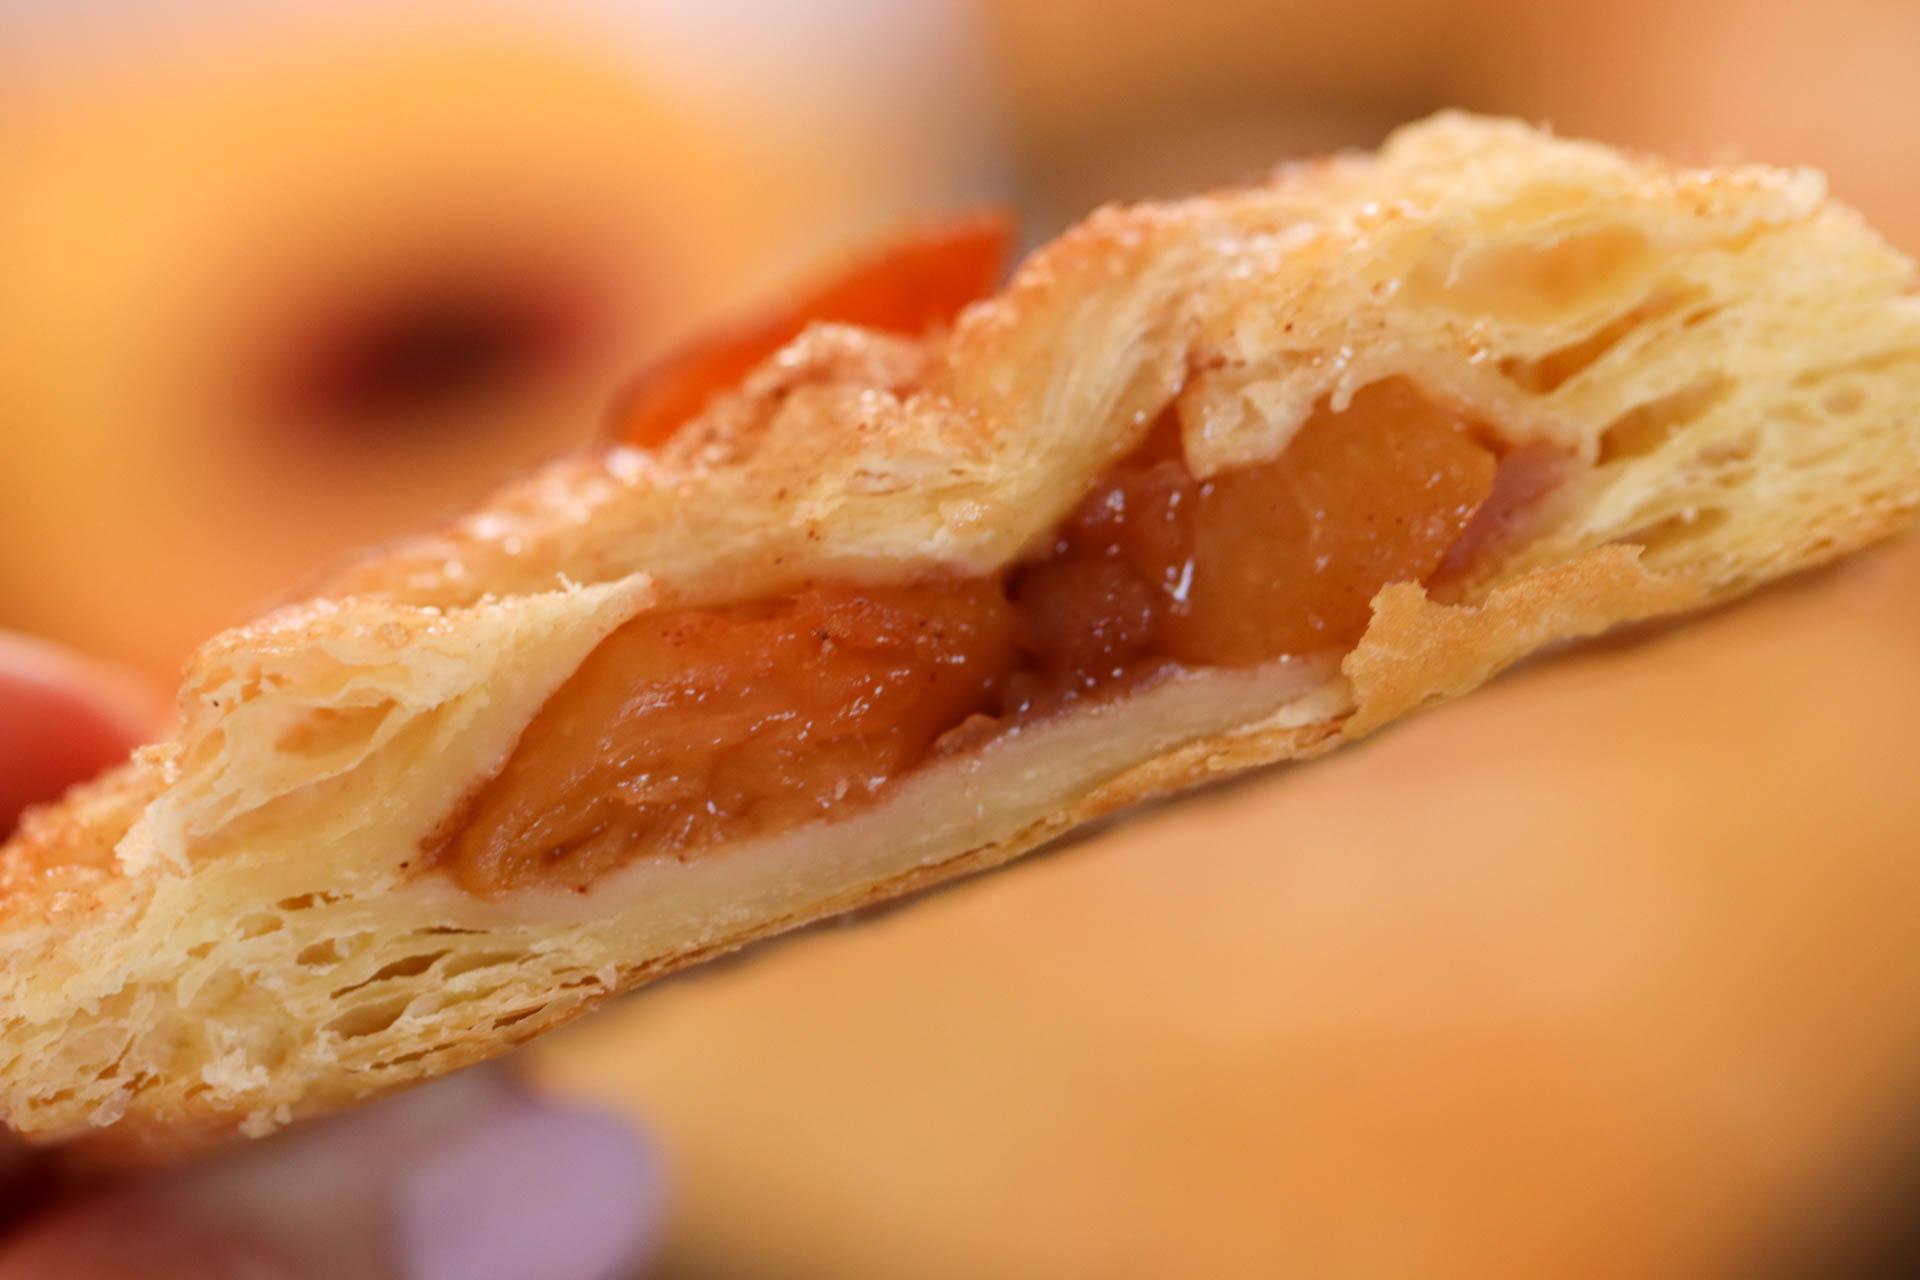 Half of a Baked Peach Hand Pie